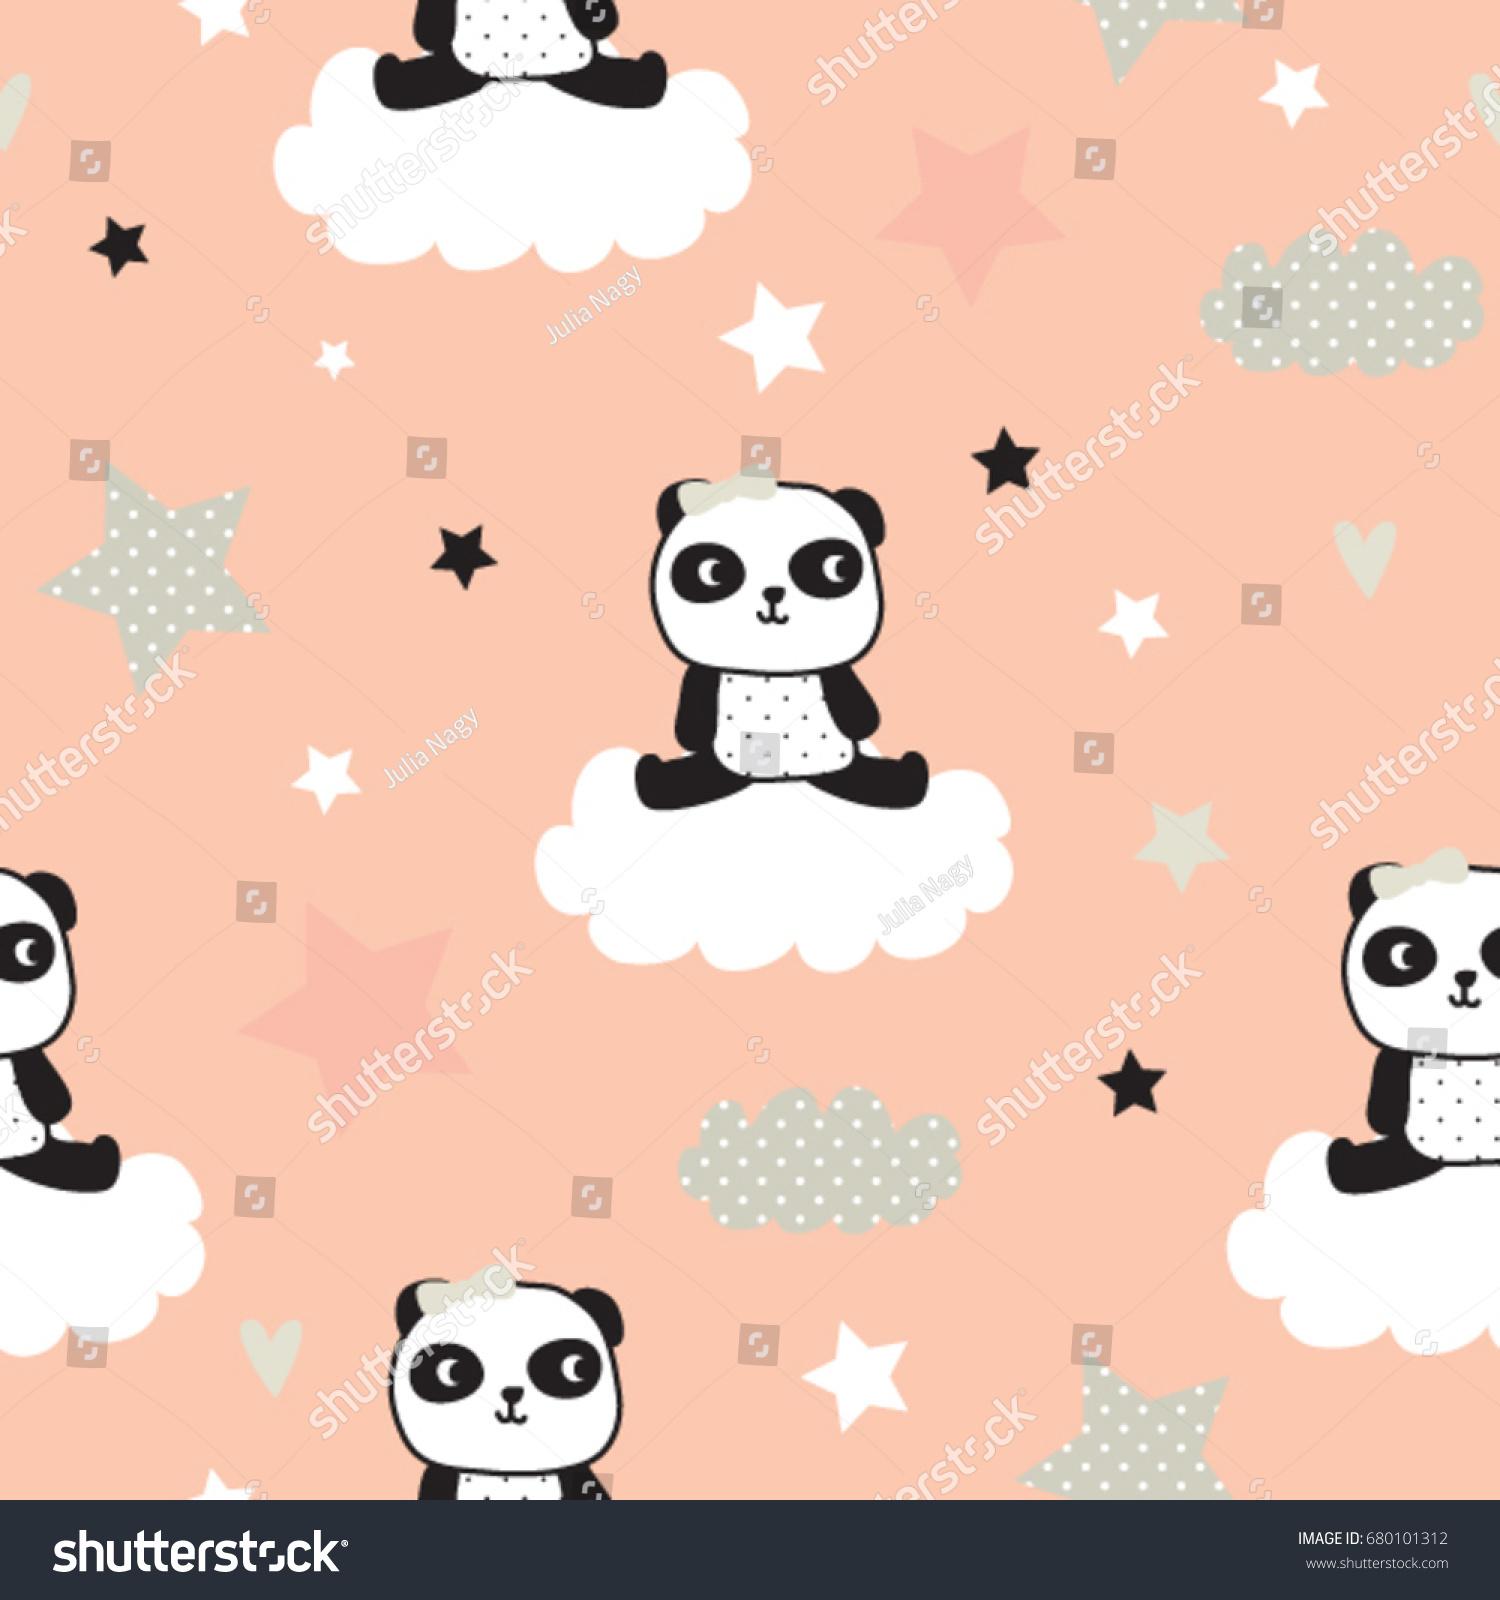 Similar Images Stock Photos Vectors Of Seamless Pattern Panda